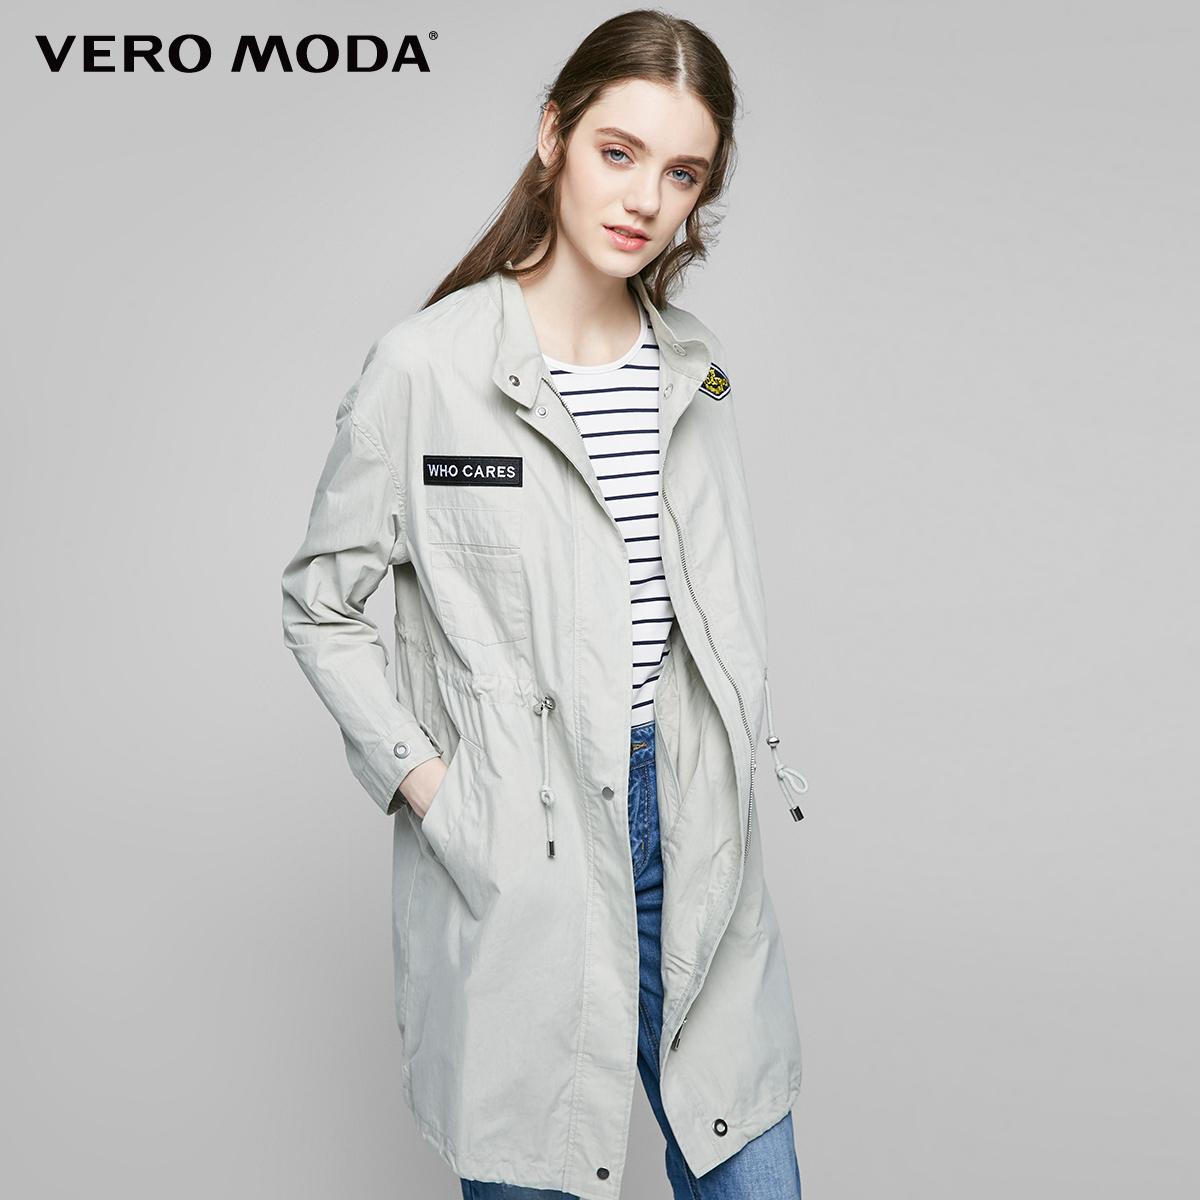 Vero Moda2017新品工装风贴布中长款薄风衣|317121529